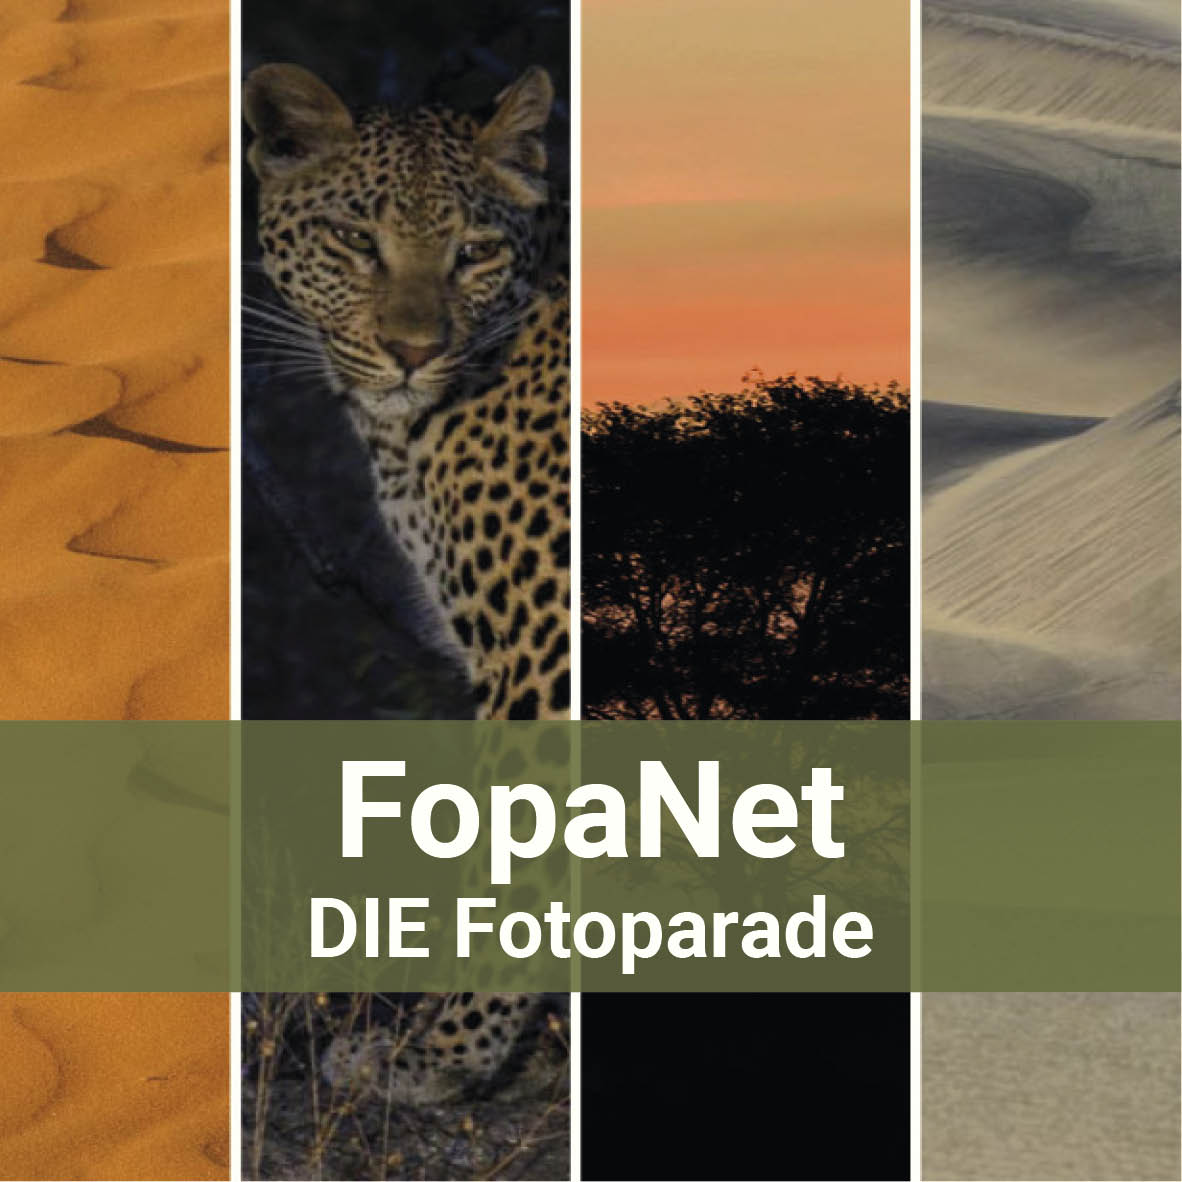 FopaNet - DIE Fotoparade